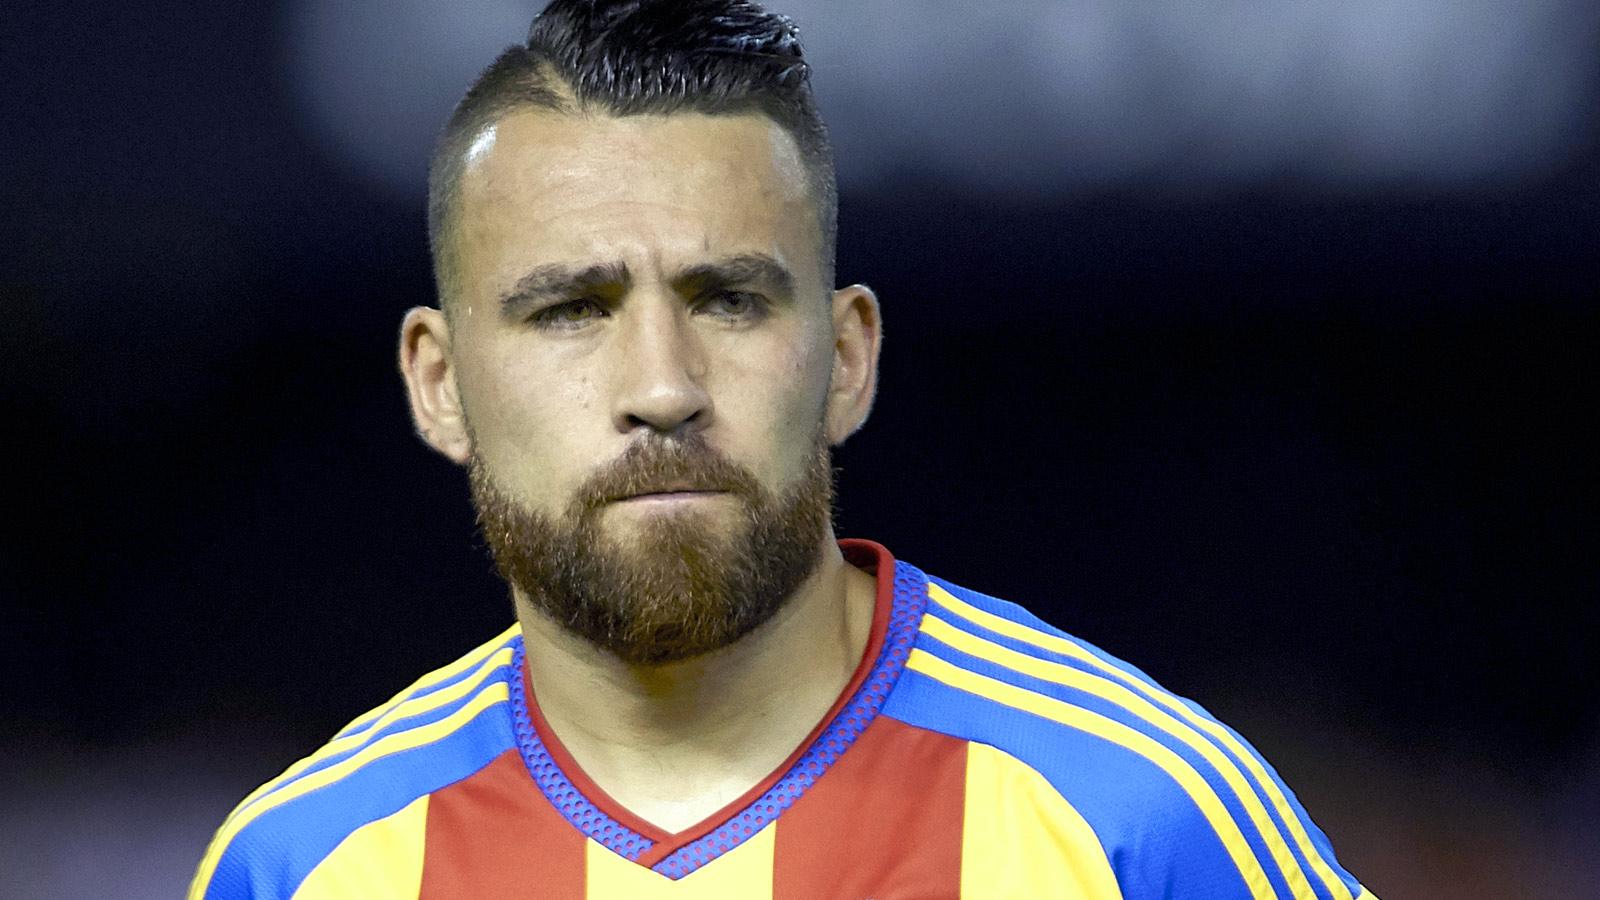 Argentina defender Otamendi joins Manchester City from Valencia